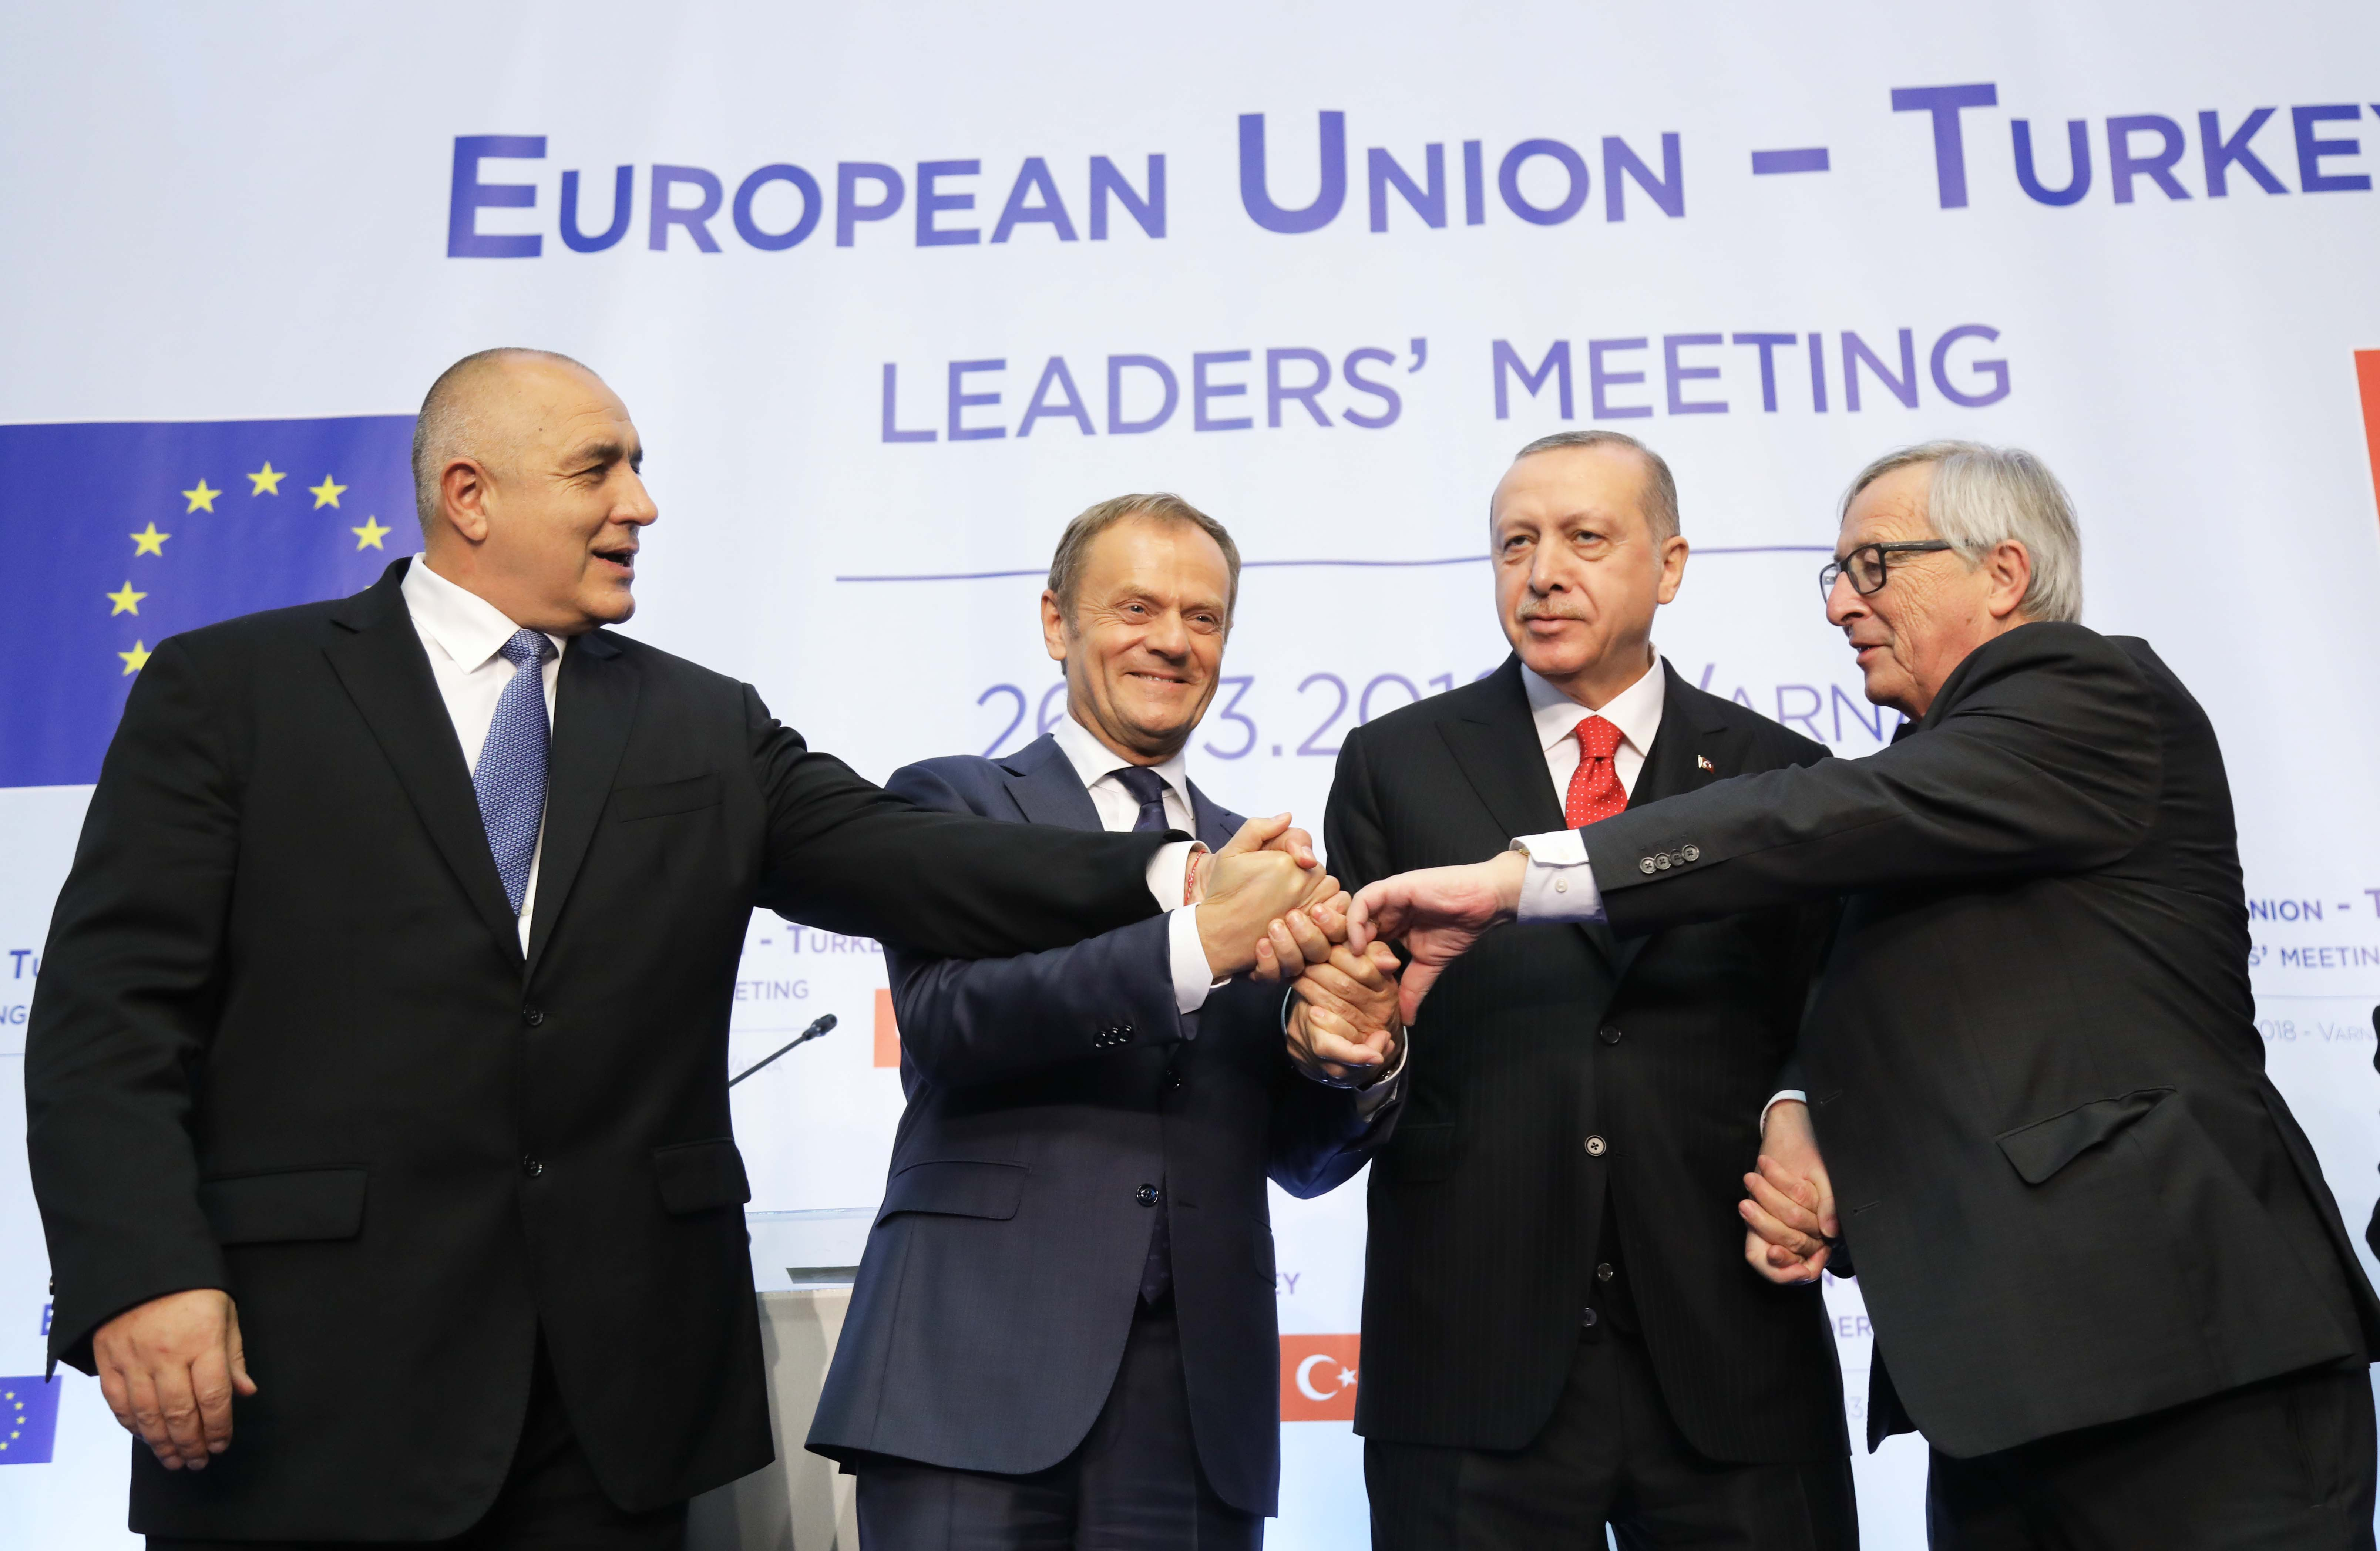 Varna meeting: Alexis Tsipras will be briefed by Boyko Borissov